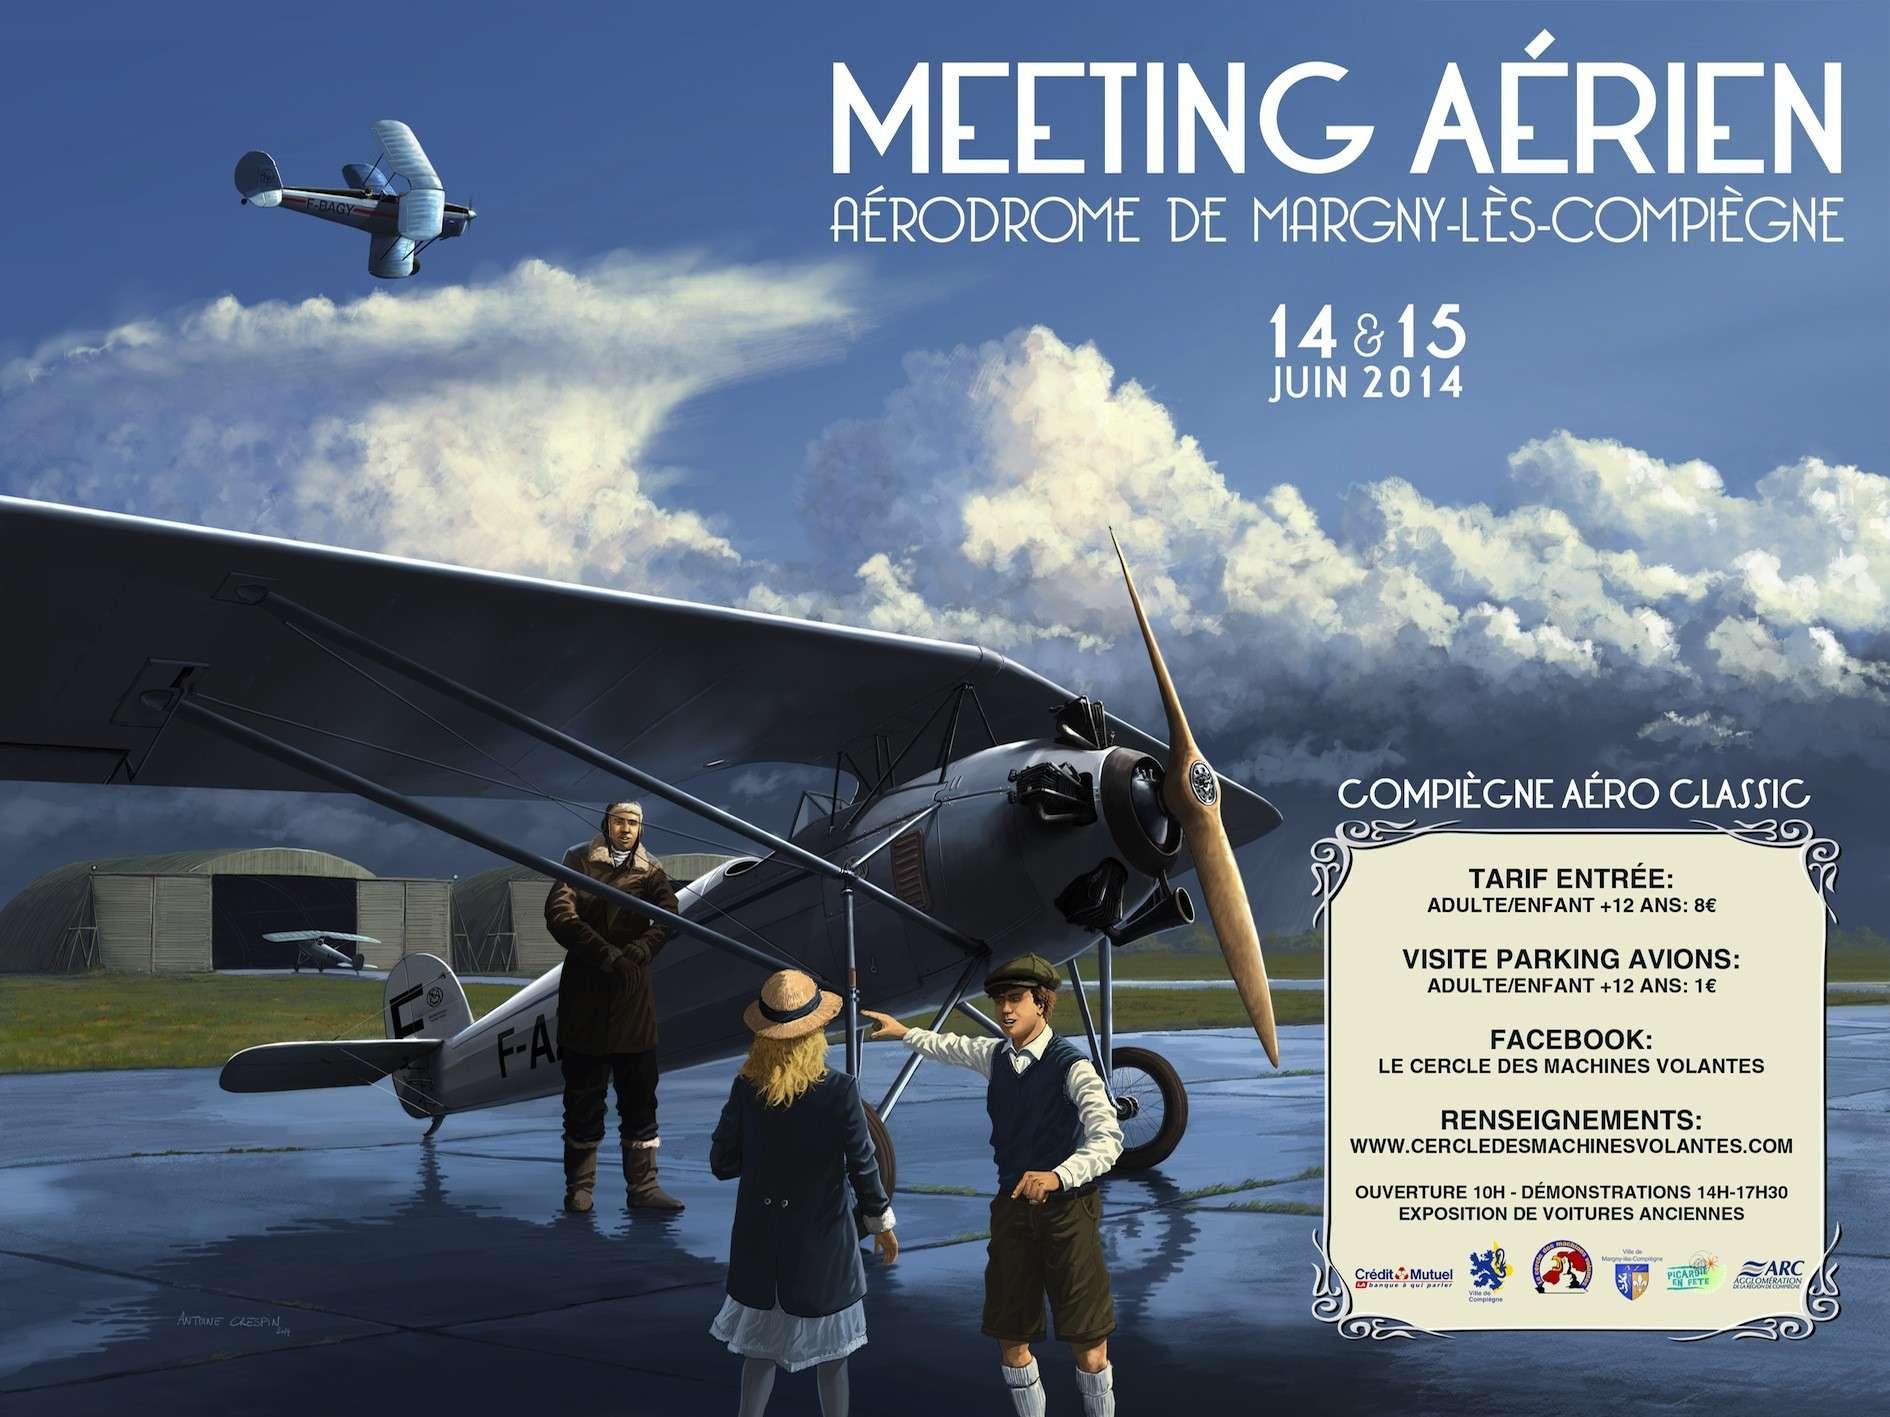 Compiègne Aéro-Classic 2014, Meeting Aerien 2014,Manifestation Aerienne 2014, French Airshow 2014